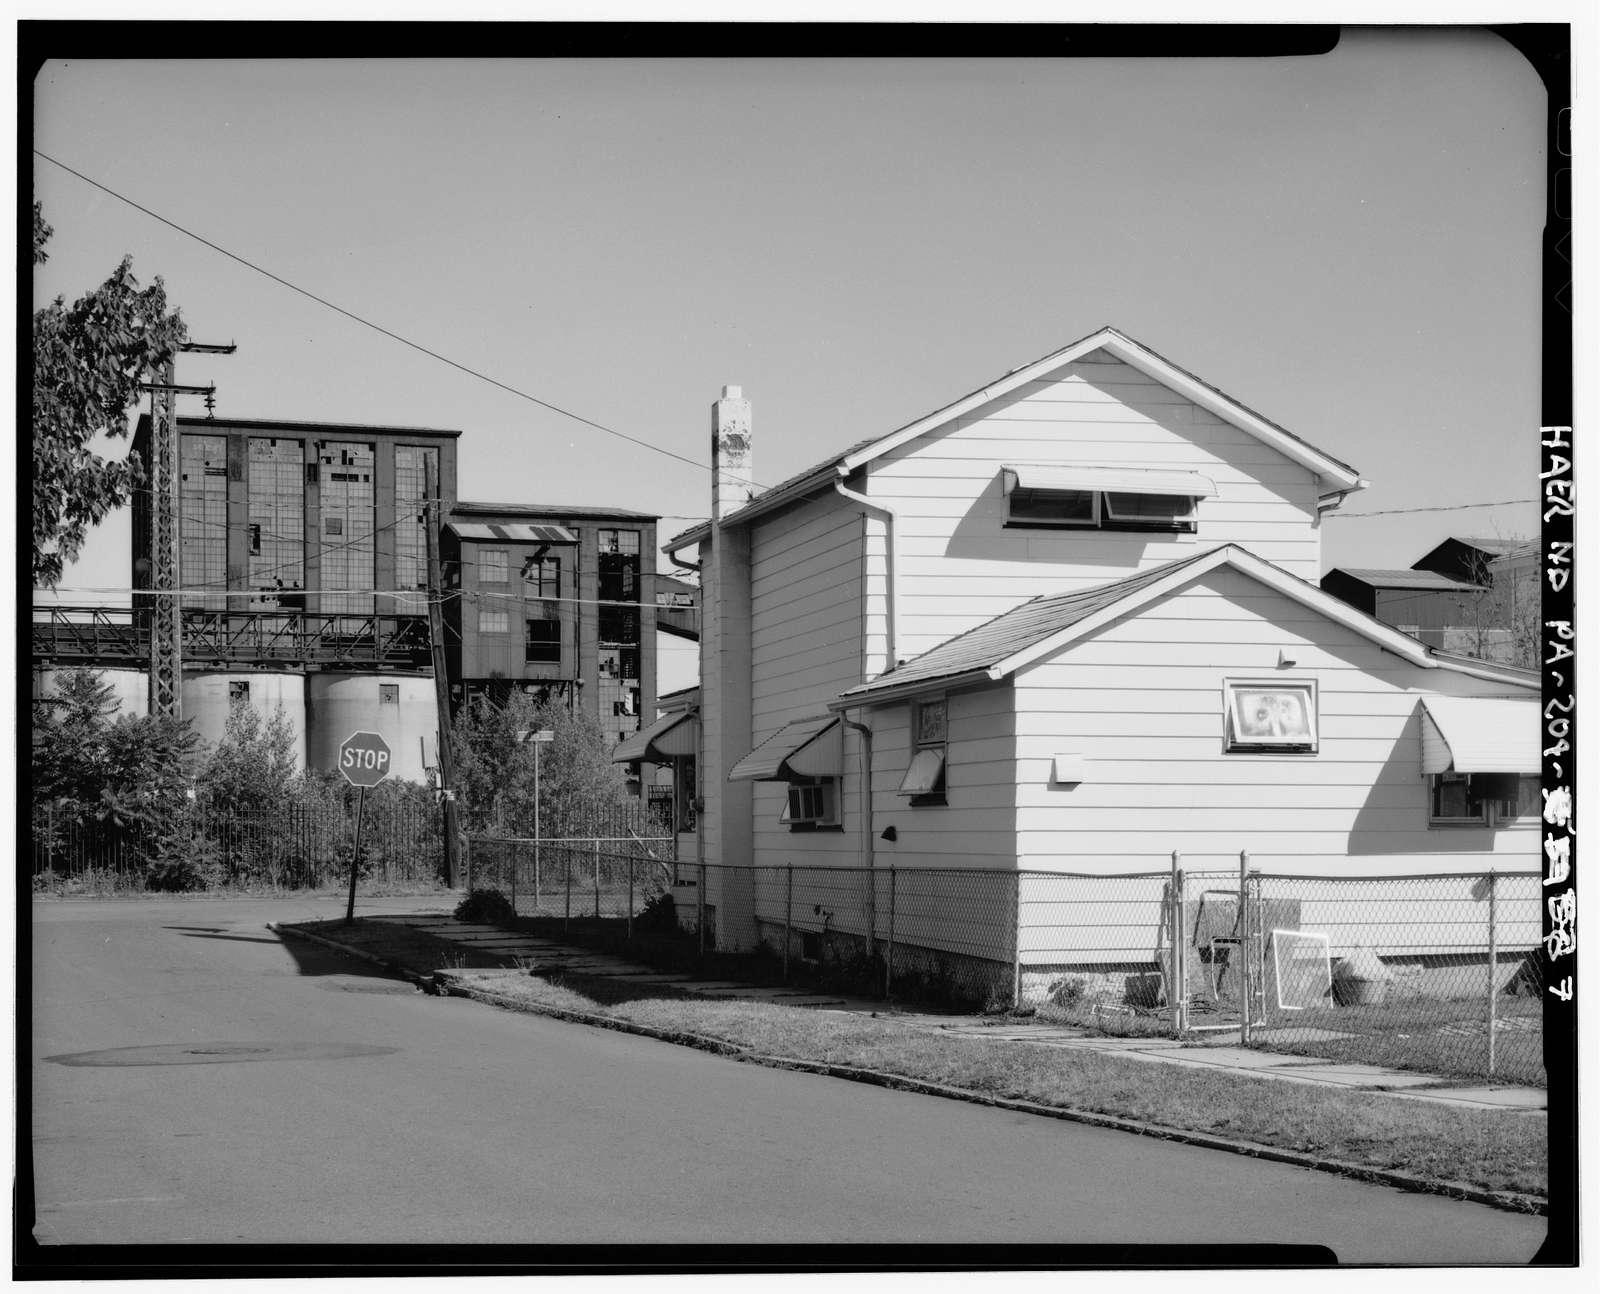 Huber Coal Breaker, 101 South Main Street, Ashley, Luzerne County, PA